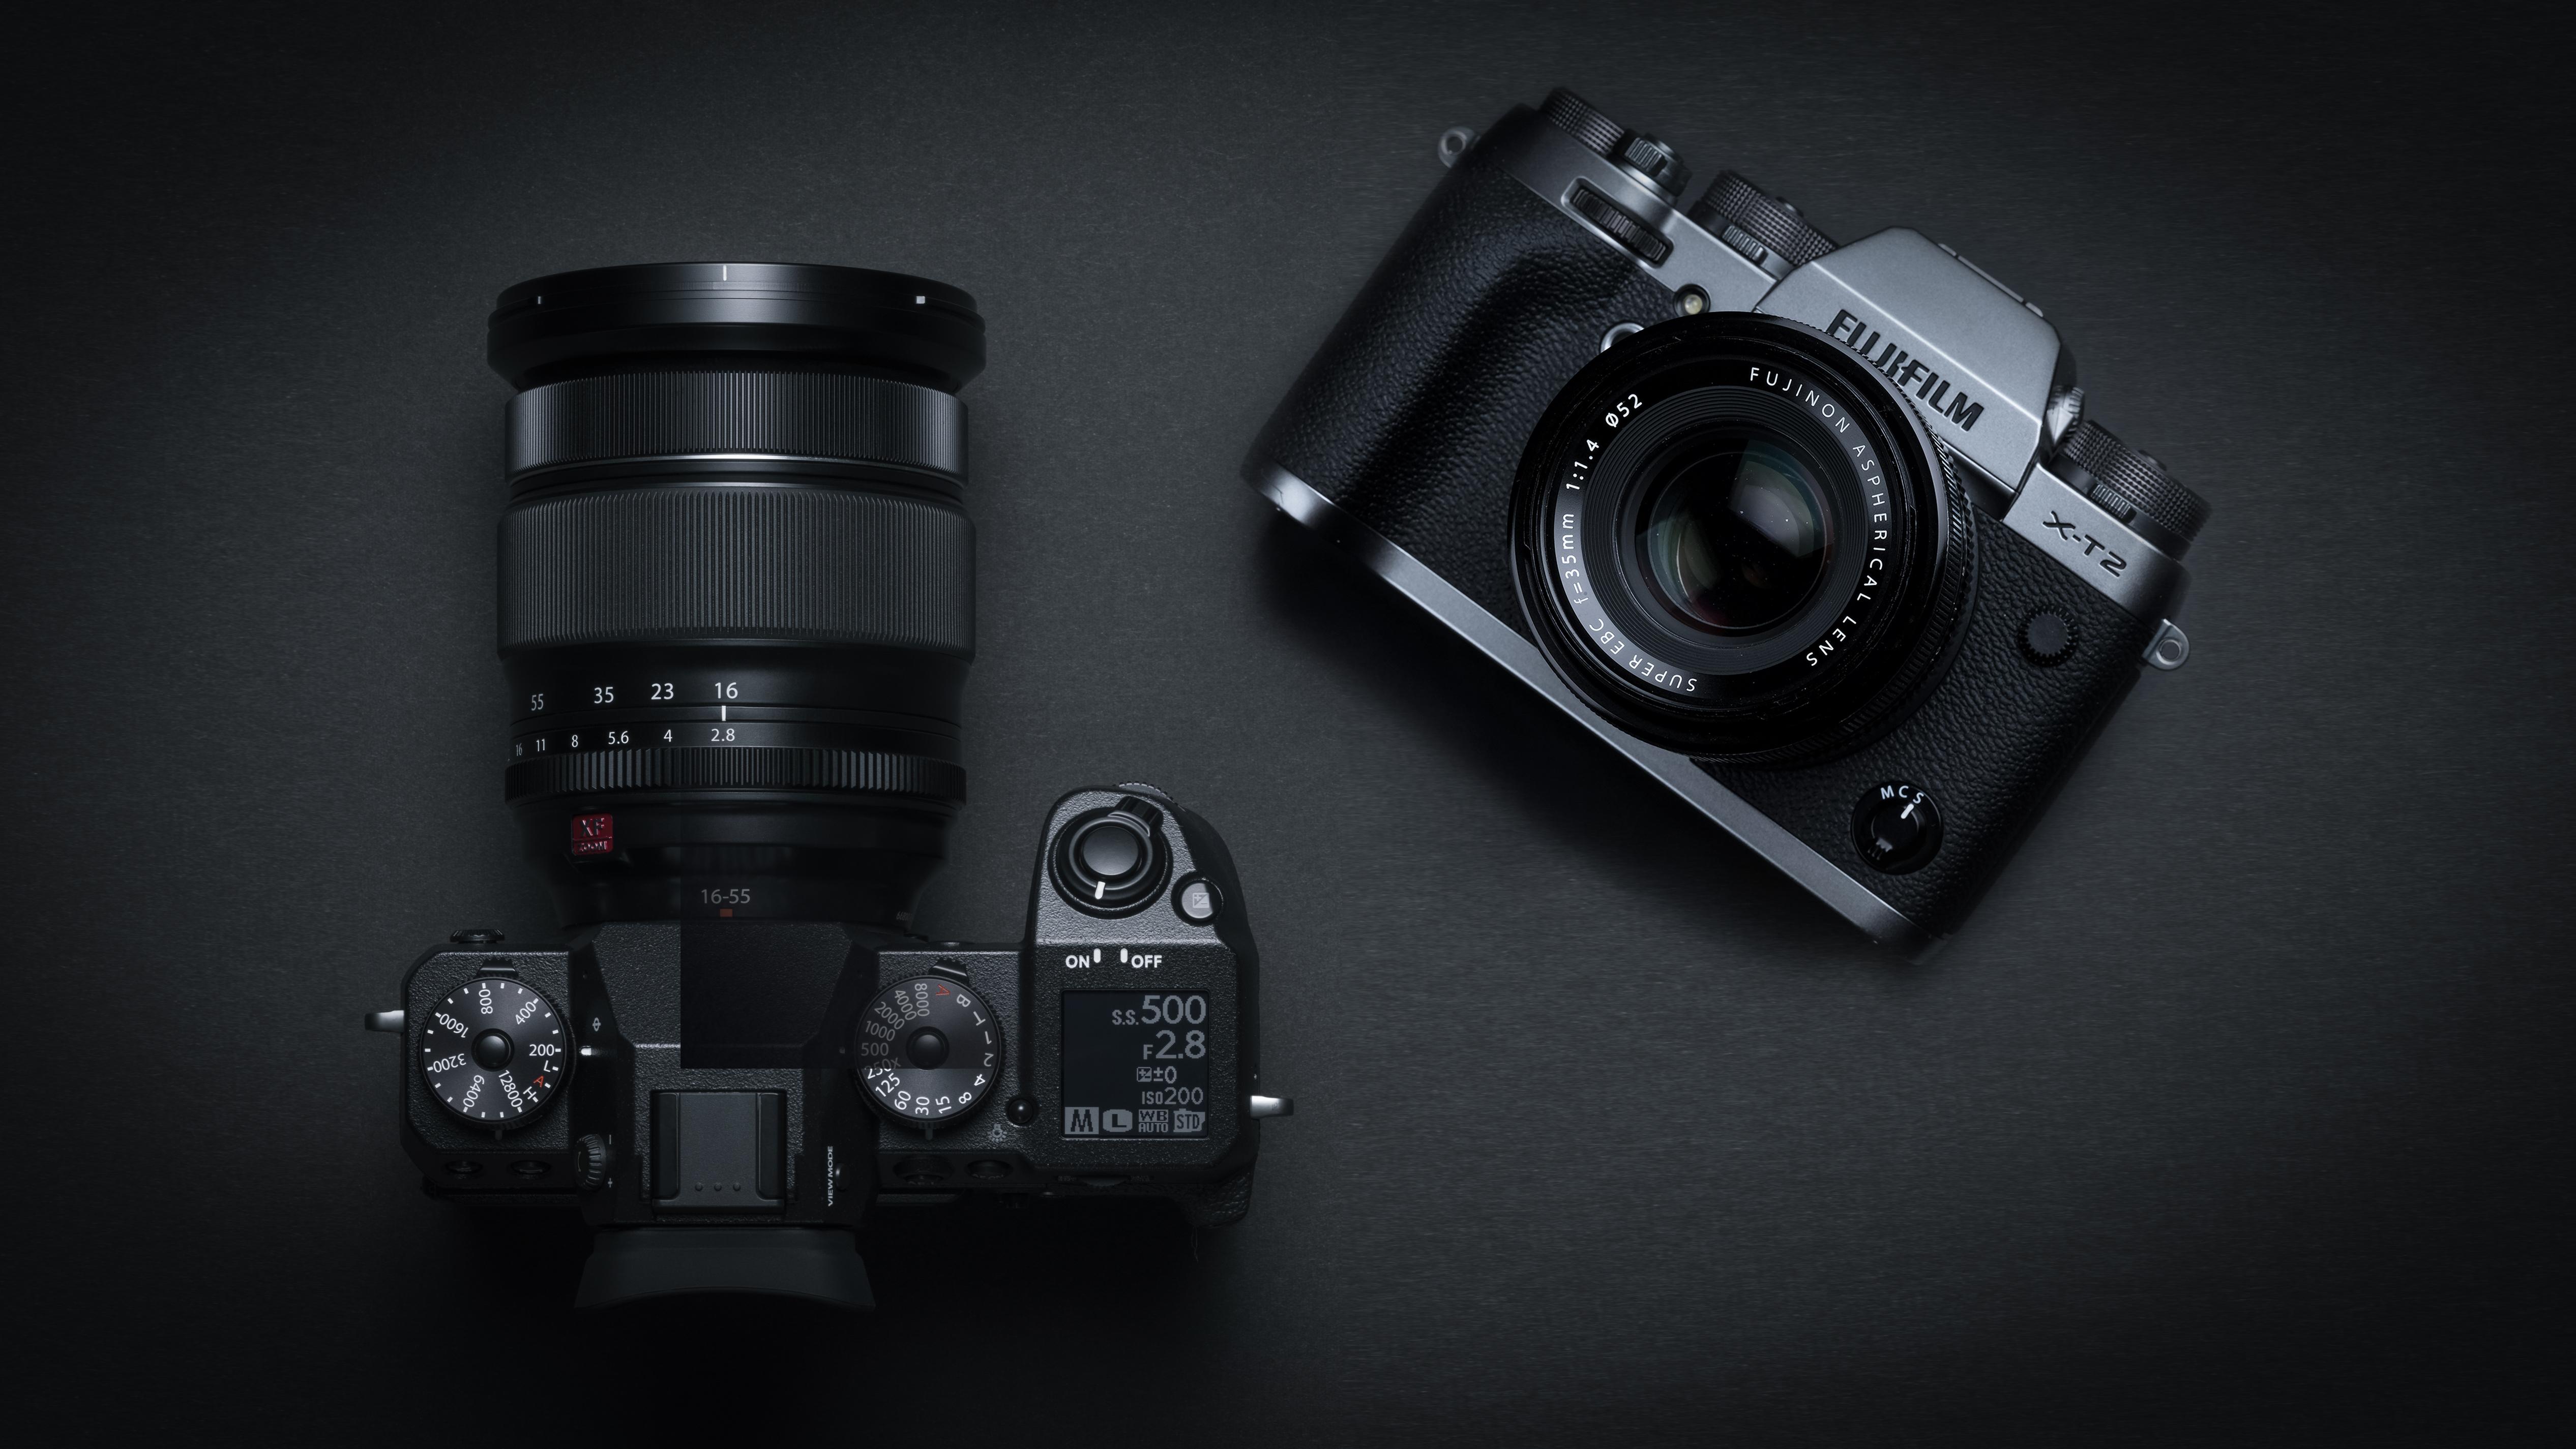 Fujifilm X H1 Vs T2 8 Key Differences You Need To Know Techradar Body Black